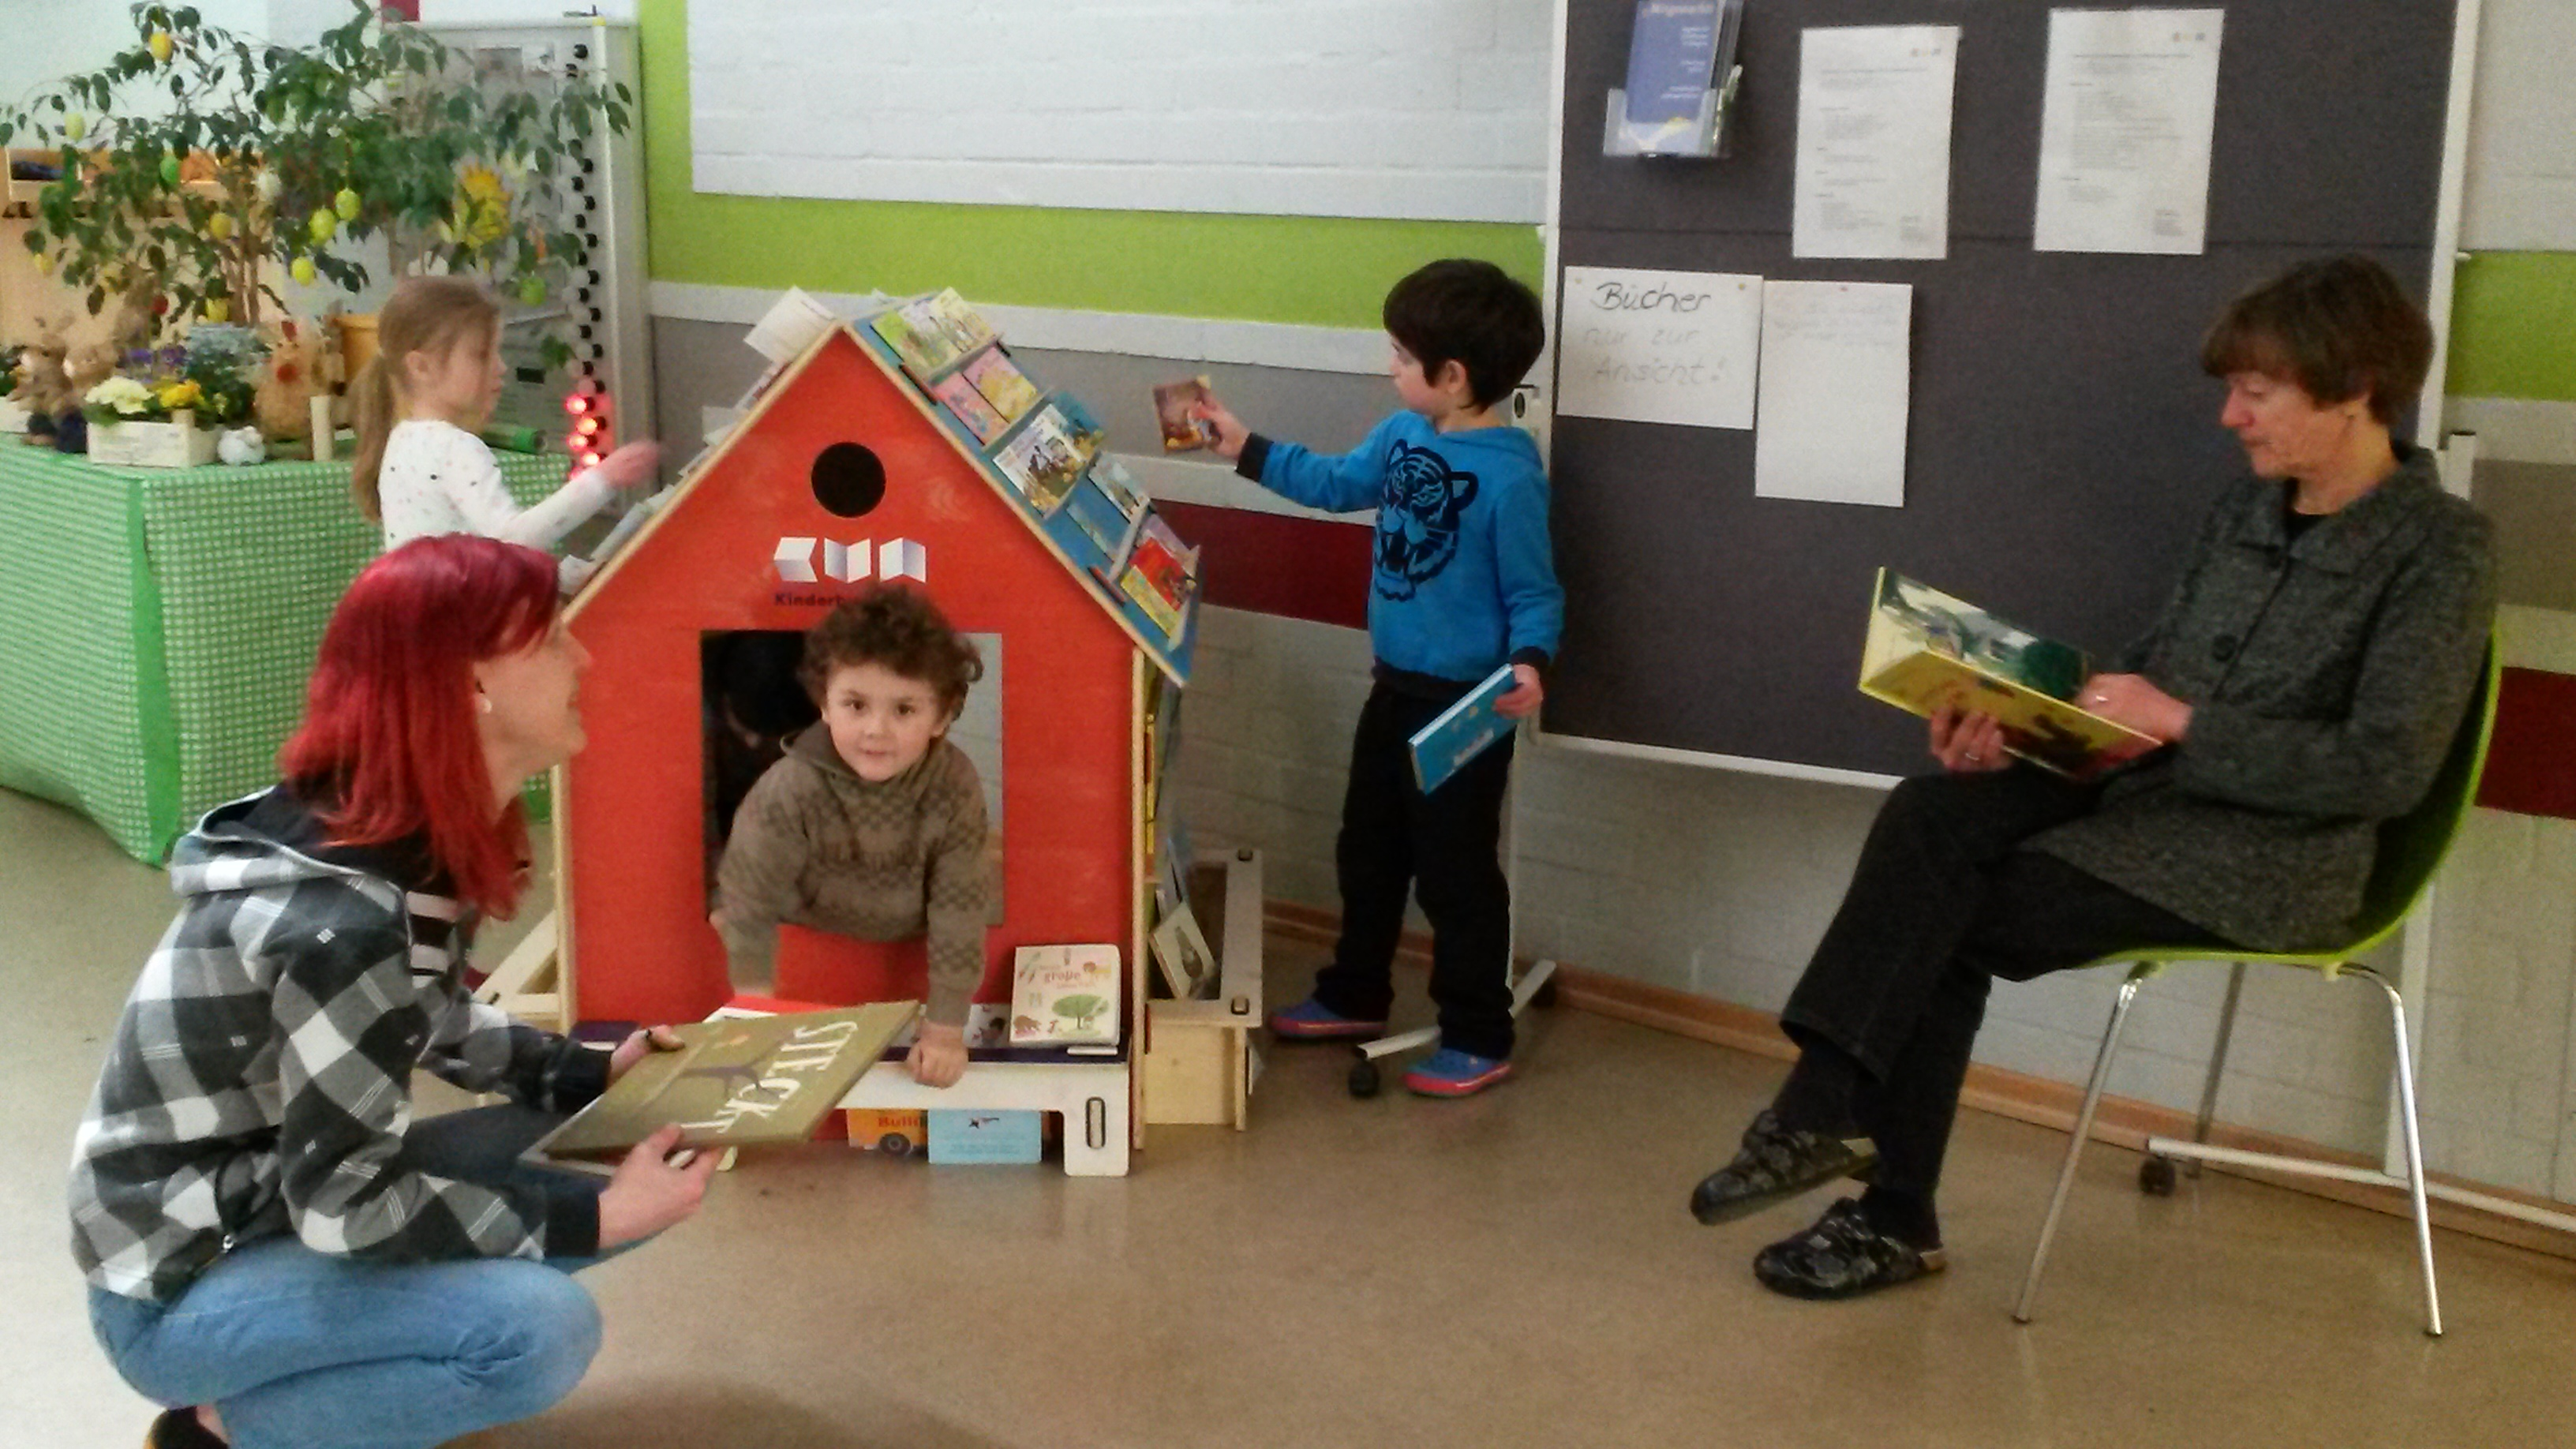 das mobile kinder buch haus kinderbuchhaus im altonaer museum. Black Bedroom Furniture Sets. Home Design Ideas